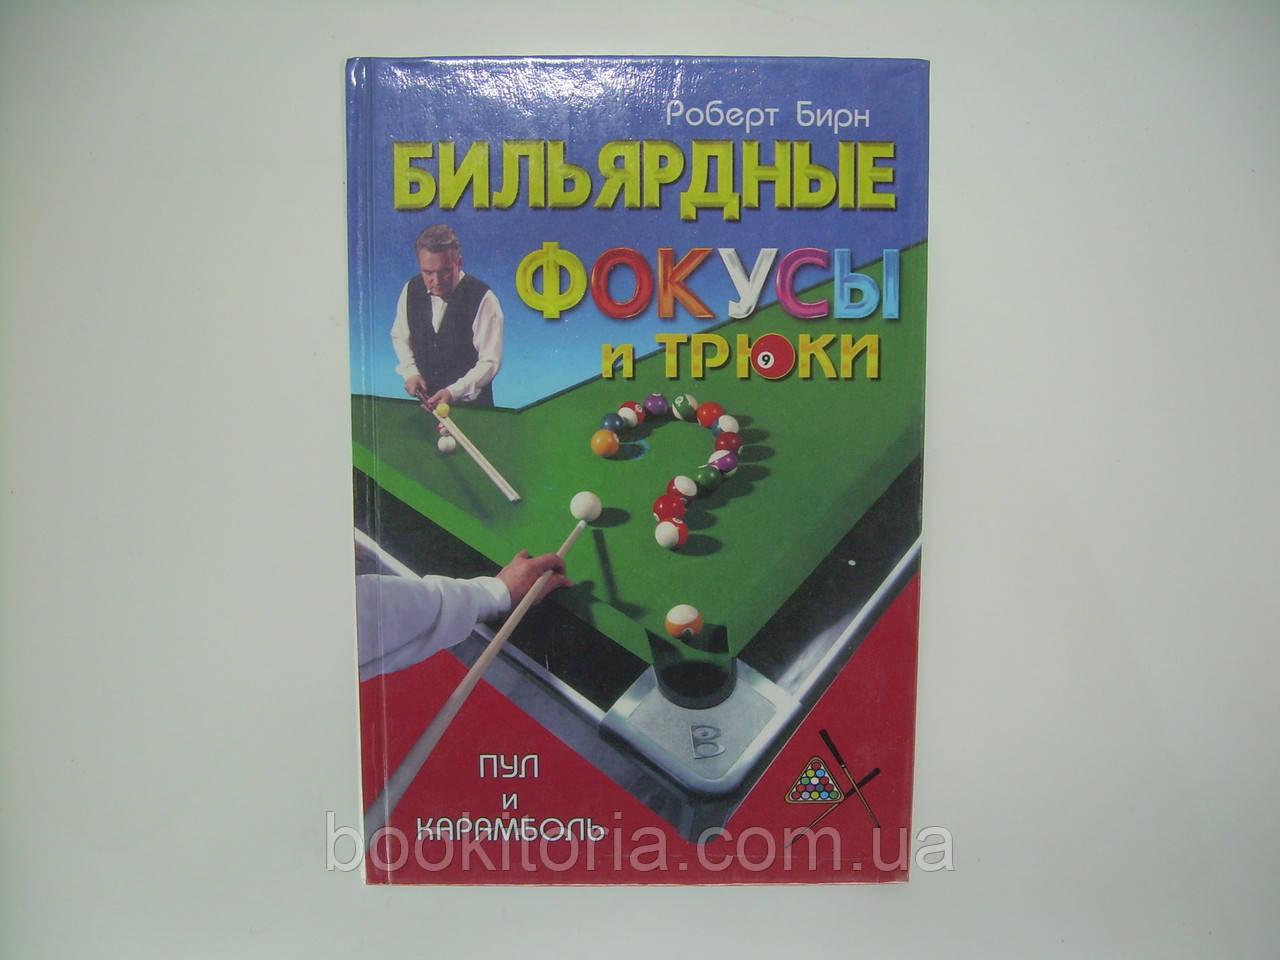 Бирн Р. Бильярдные фокусы и трюки: пул и карамболь (б/у).